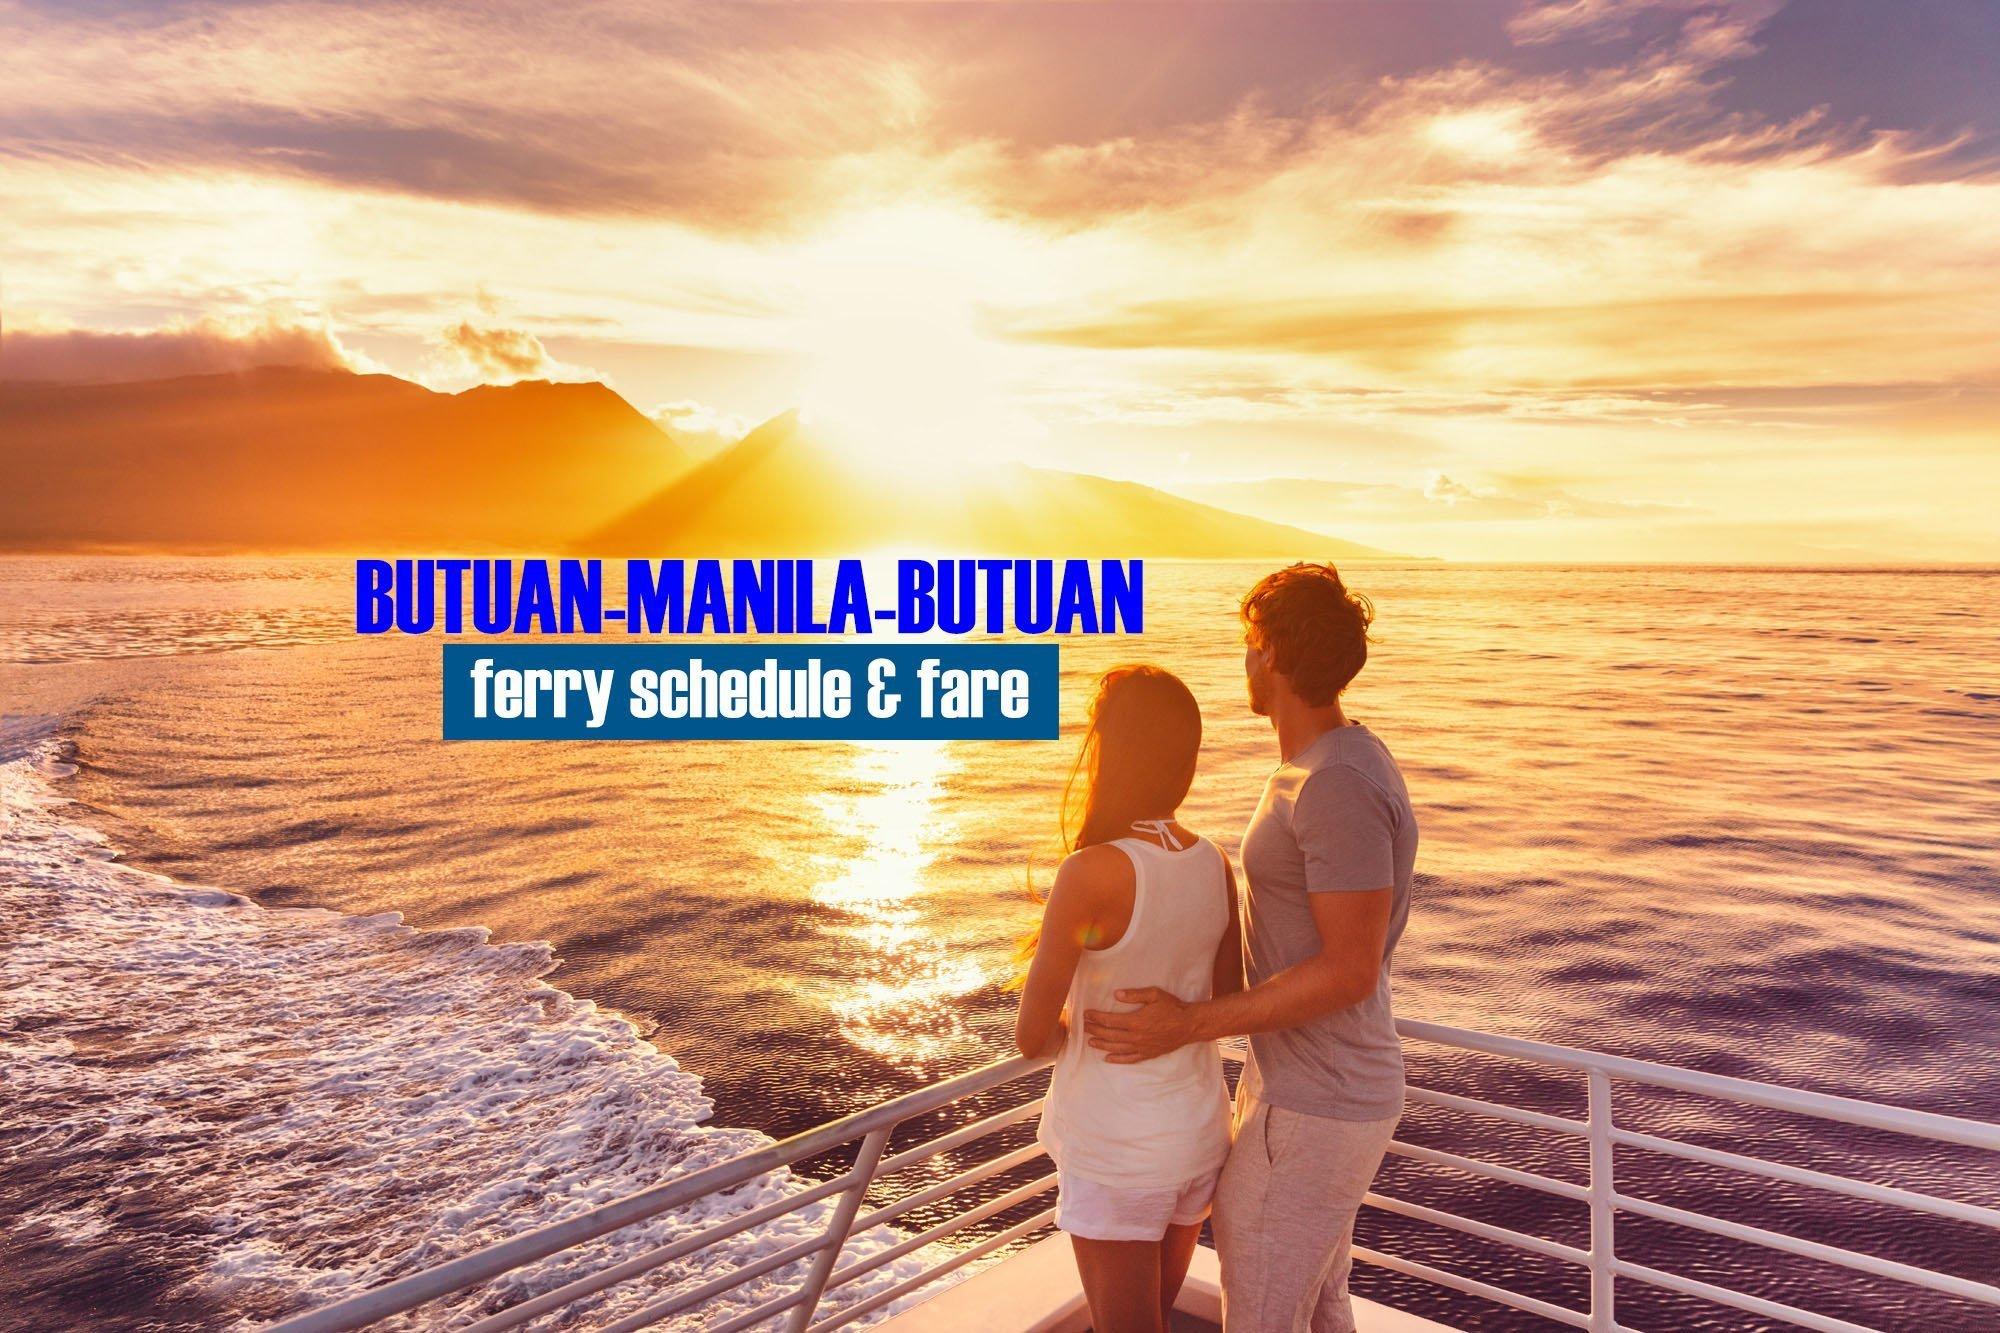 Butuan to Manila: 2019 Boat Schedule and Fare